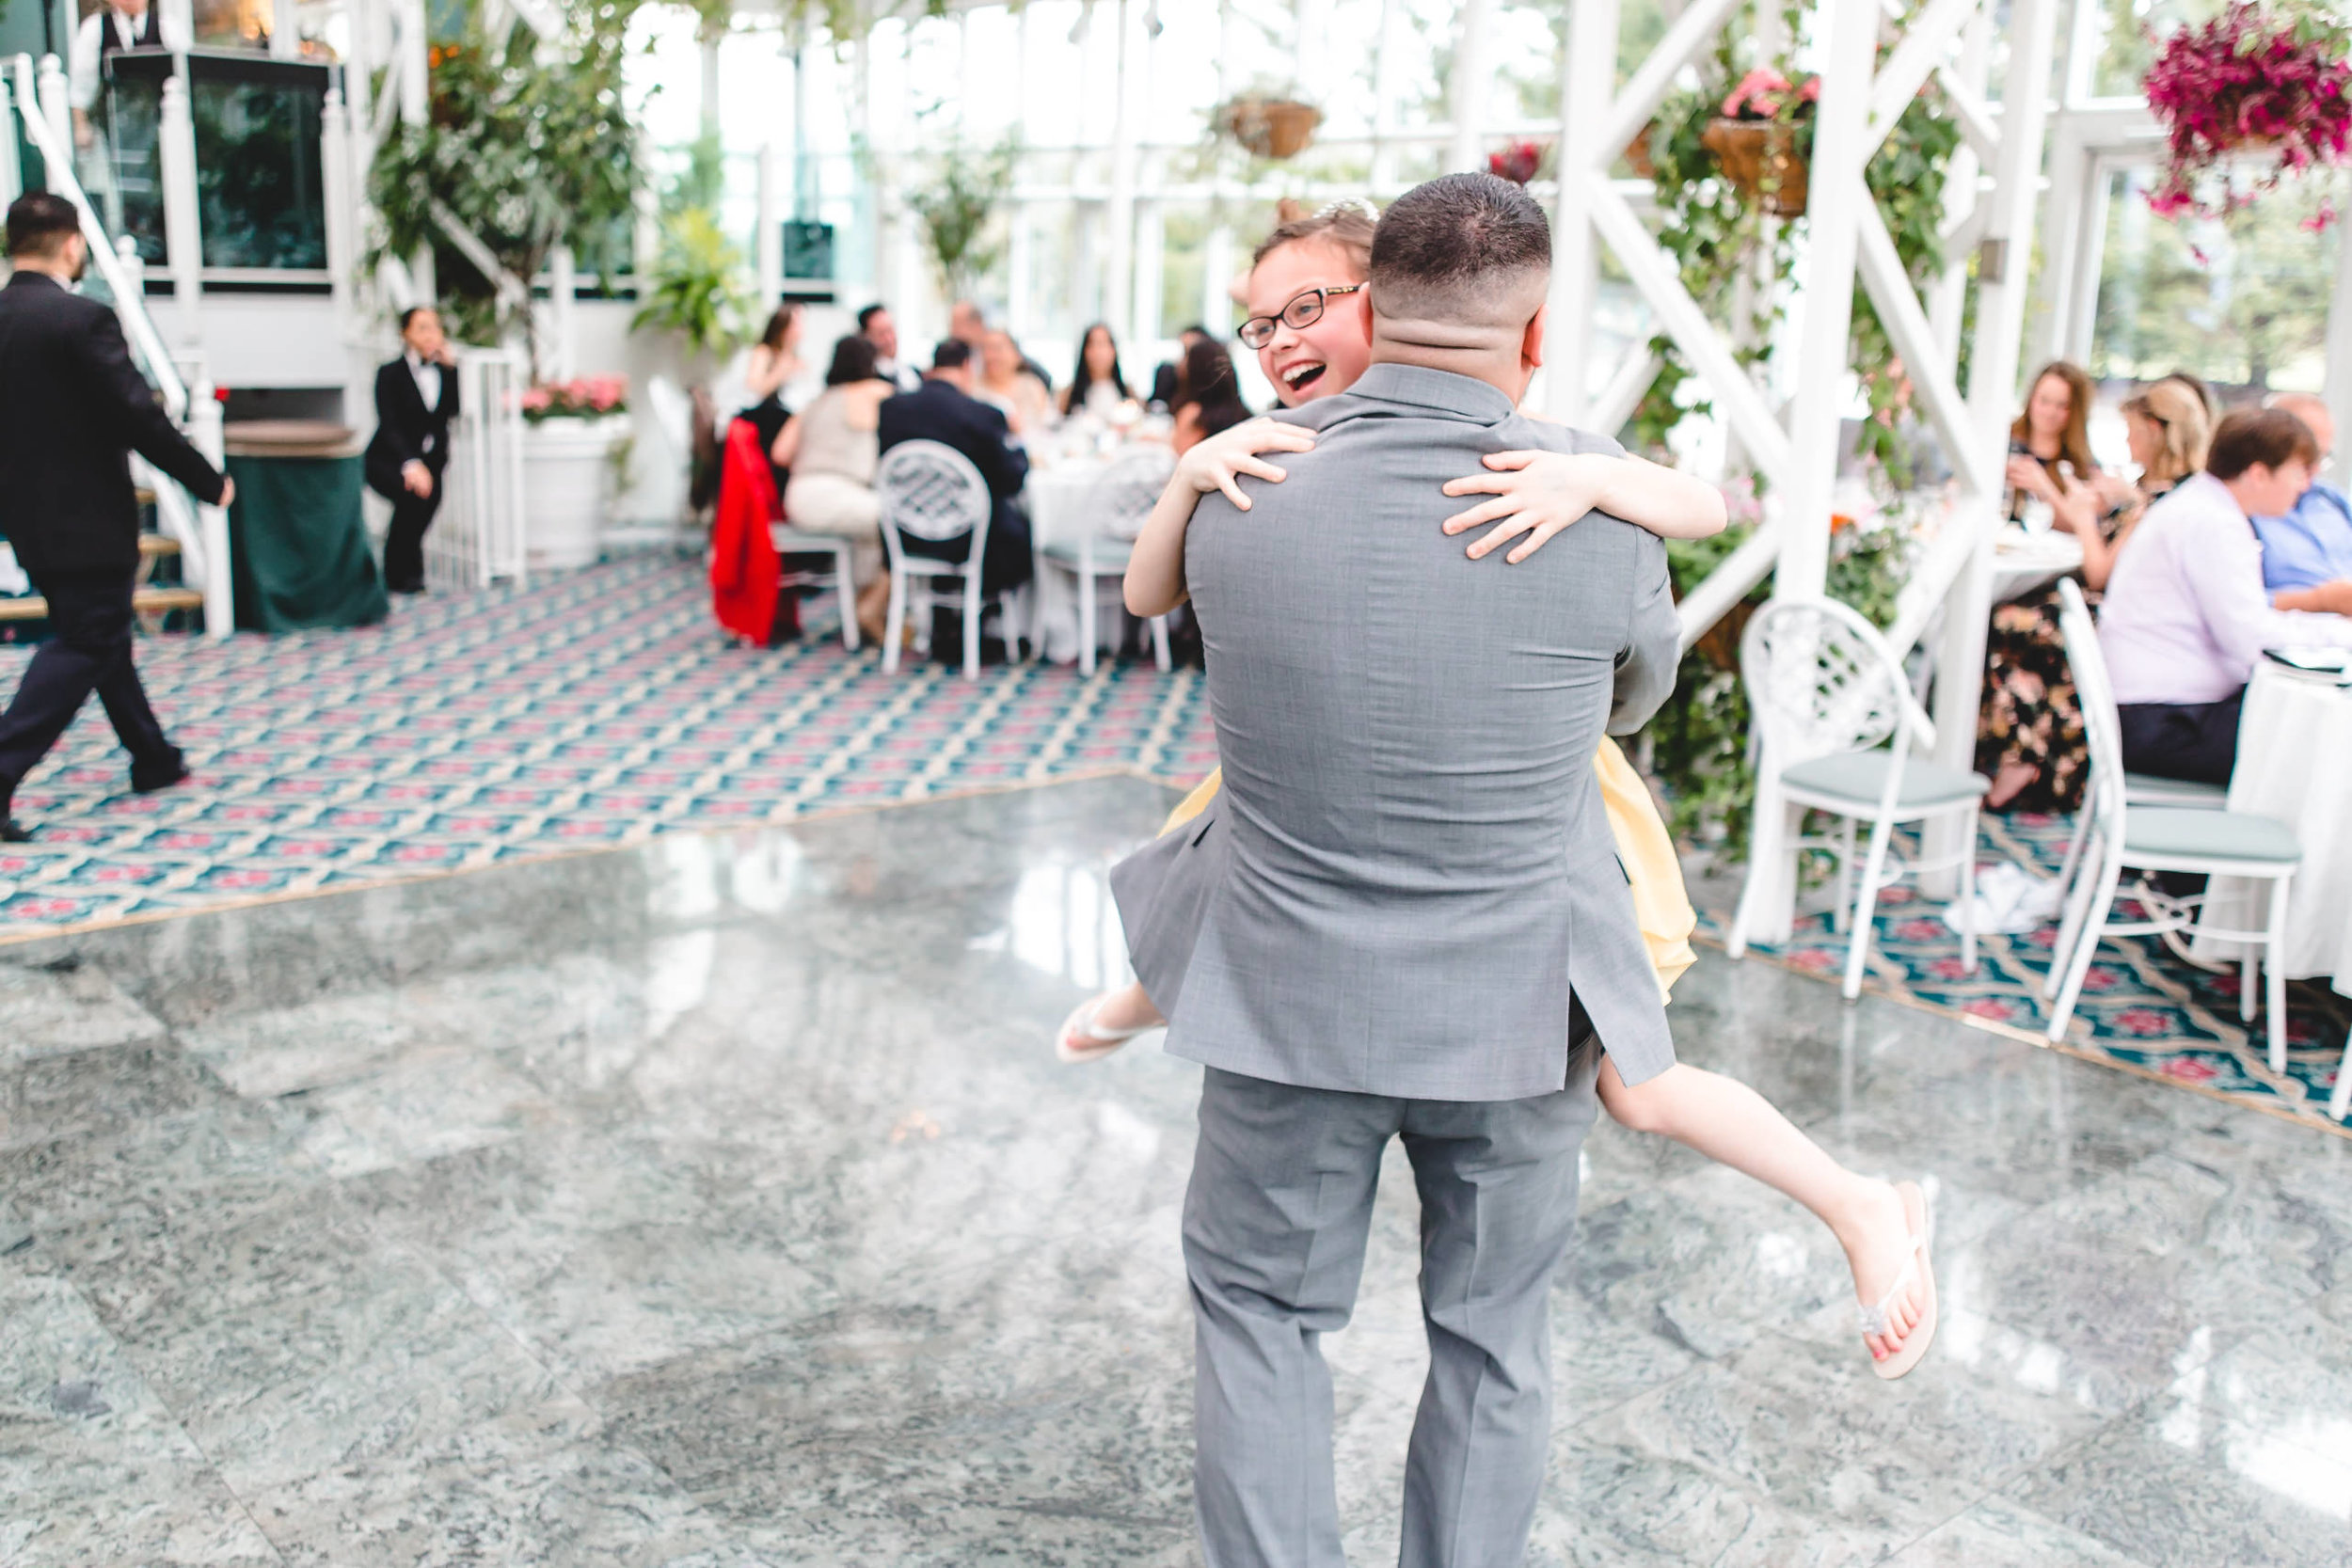 daniel_nydick_nj_photographer_headshot_wedding_event_family-30.jpg